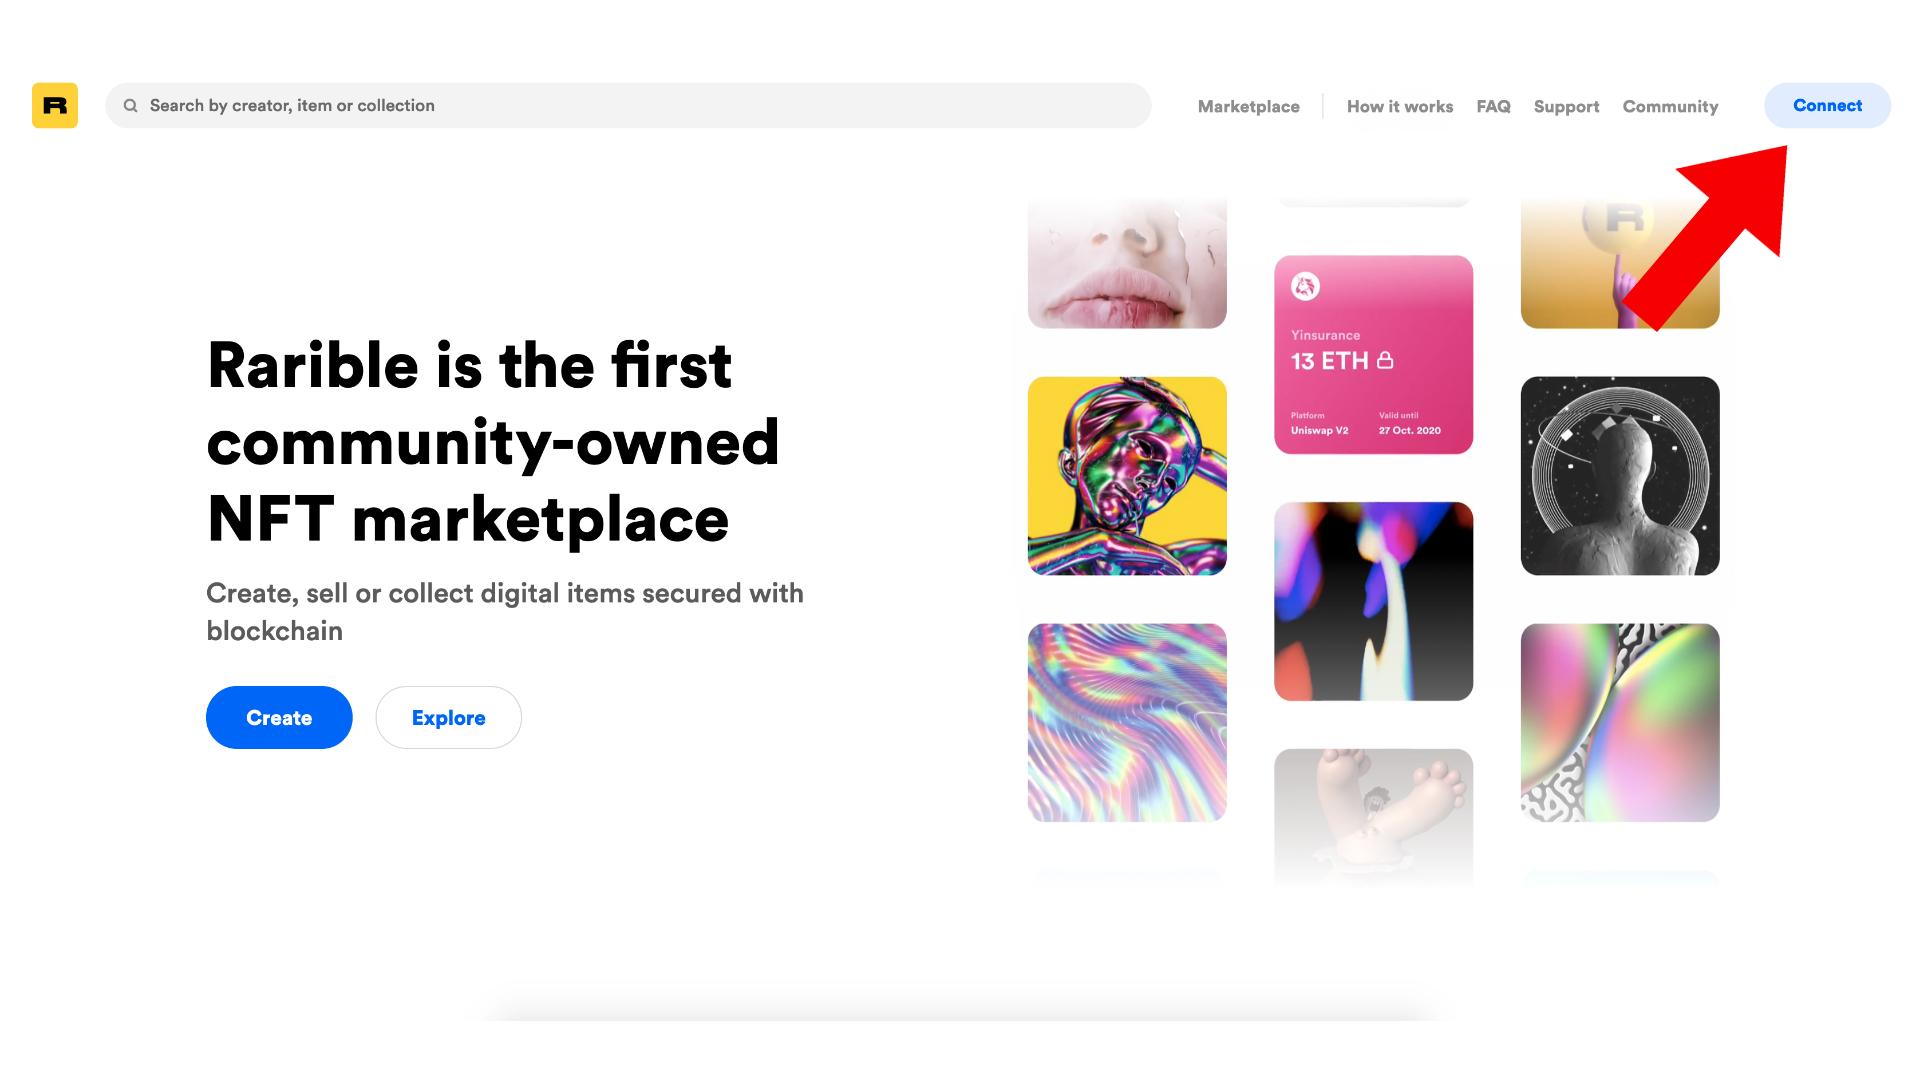 The Rarible website homepage